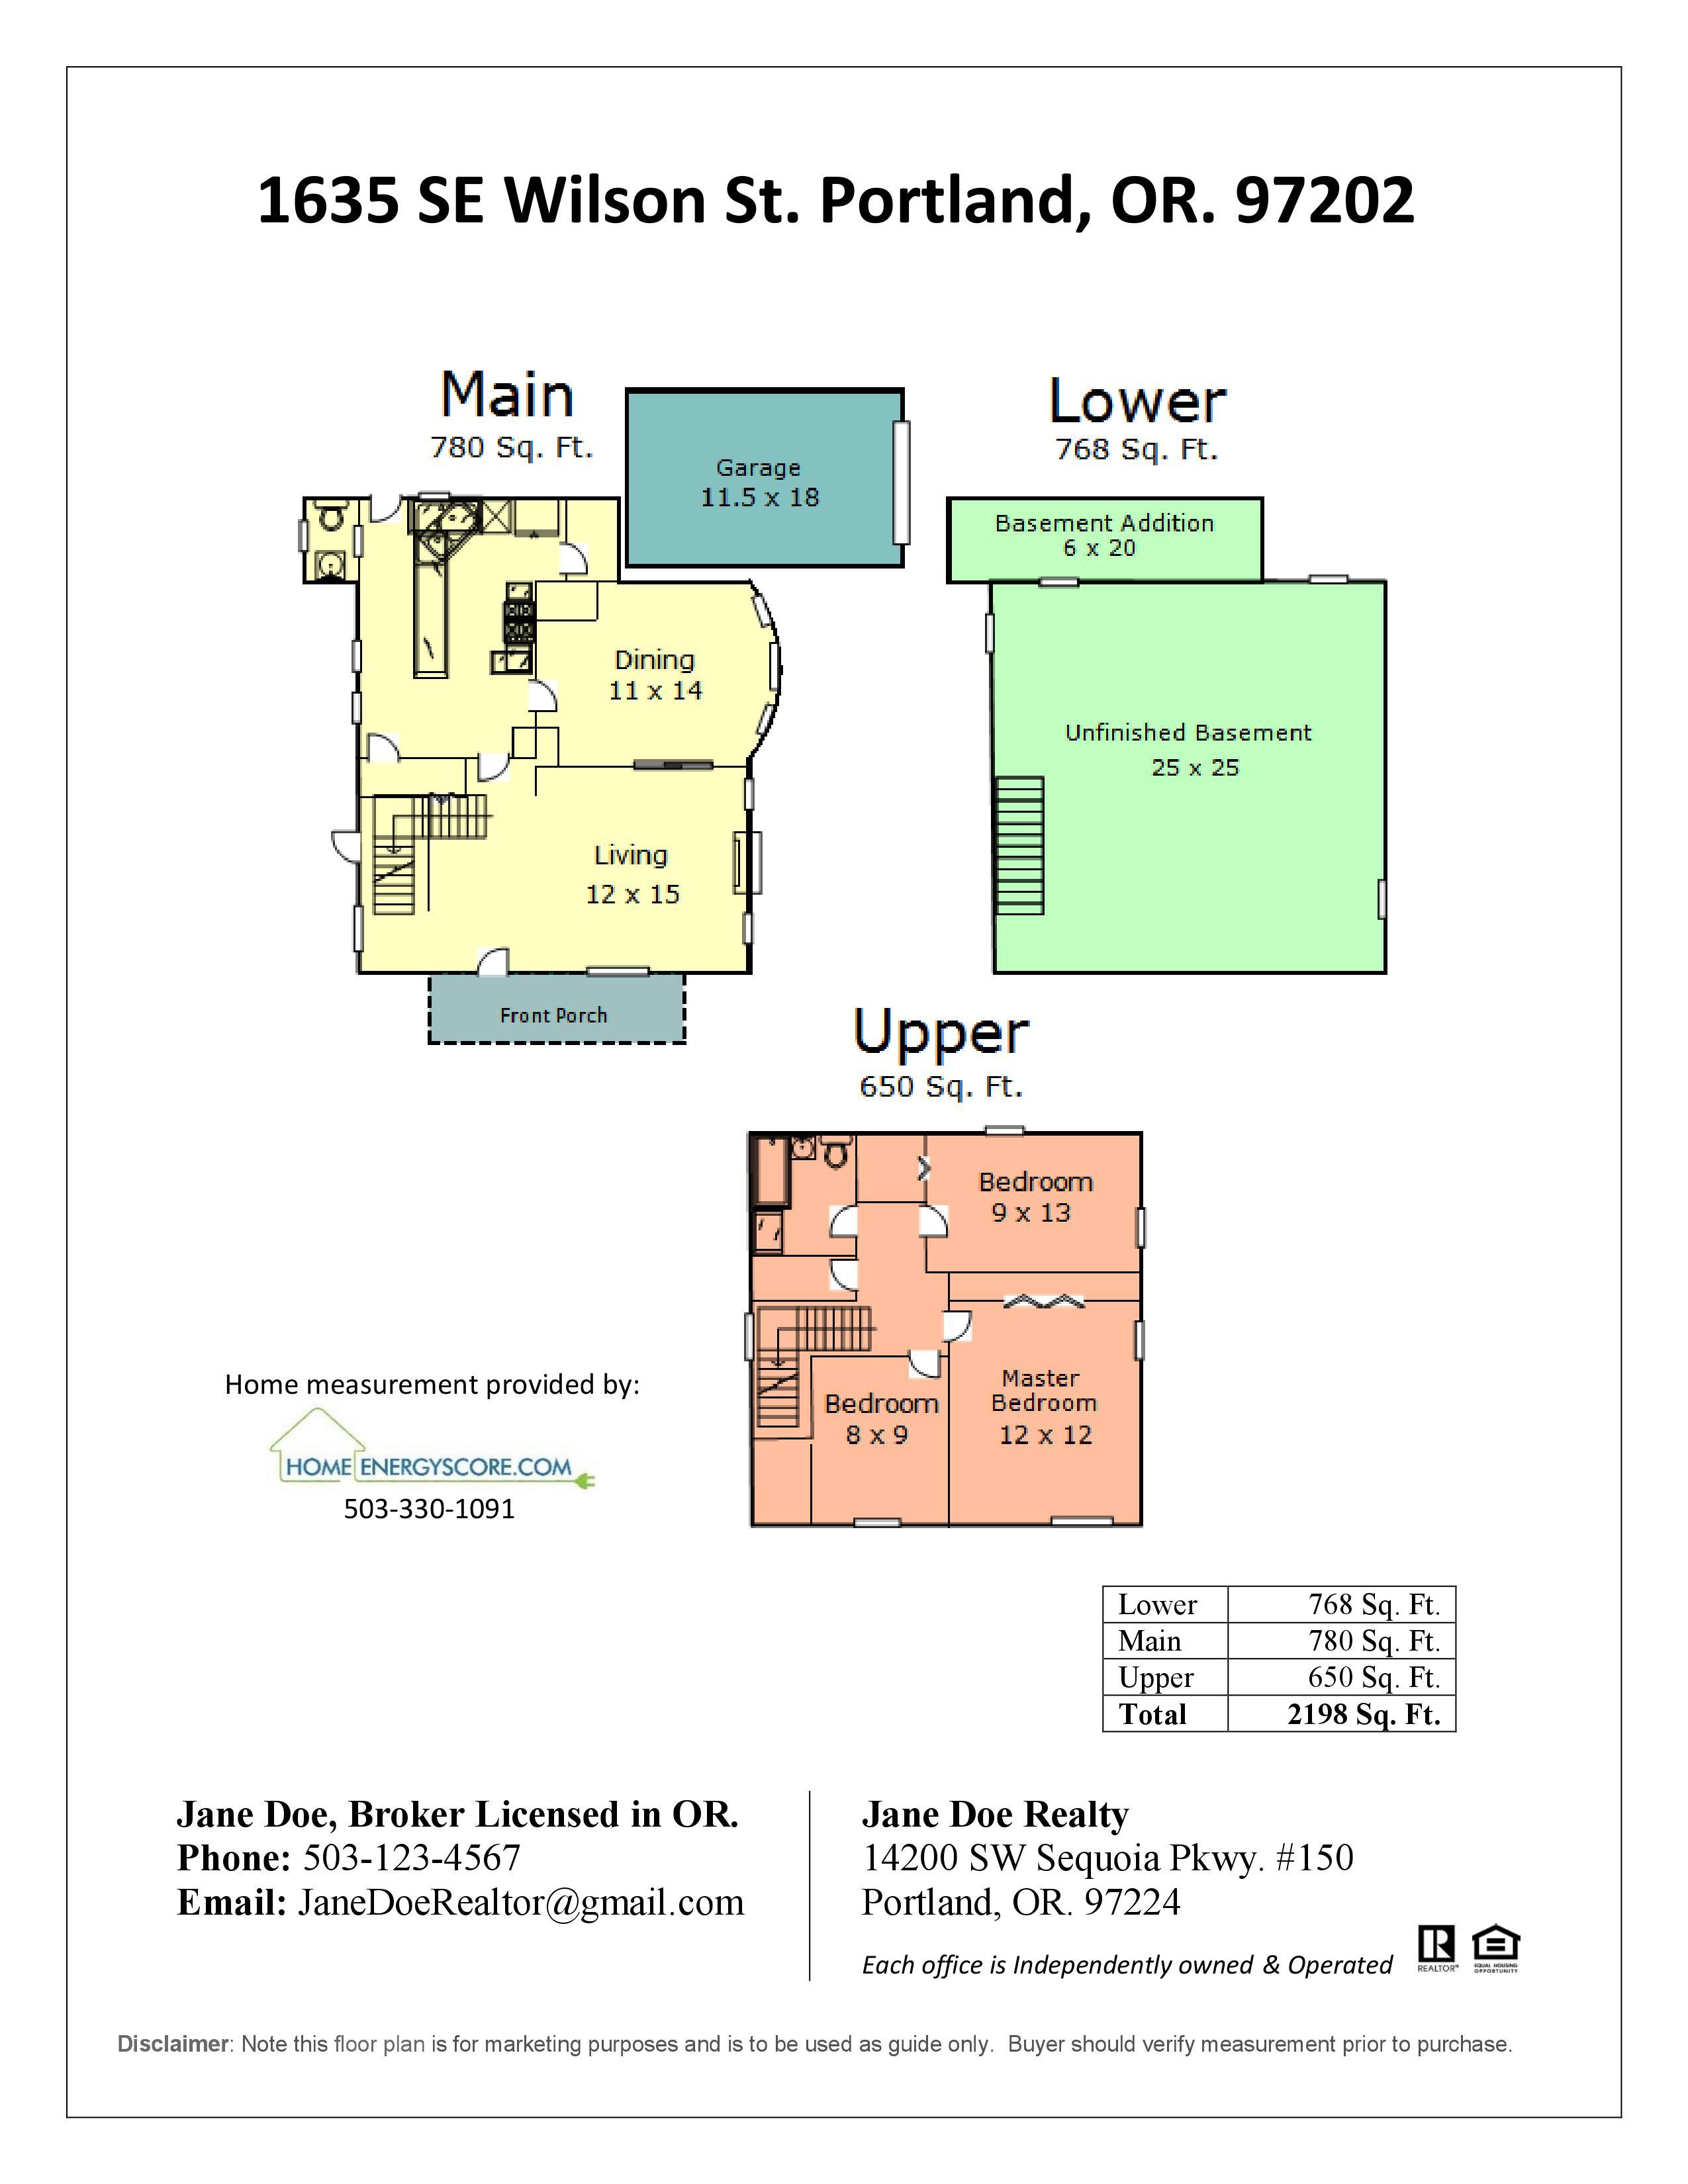 Floor Plans Home Energy Score – Us Home Floor Plans